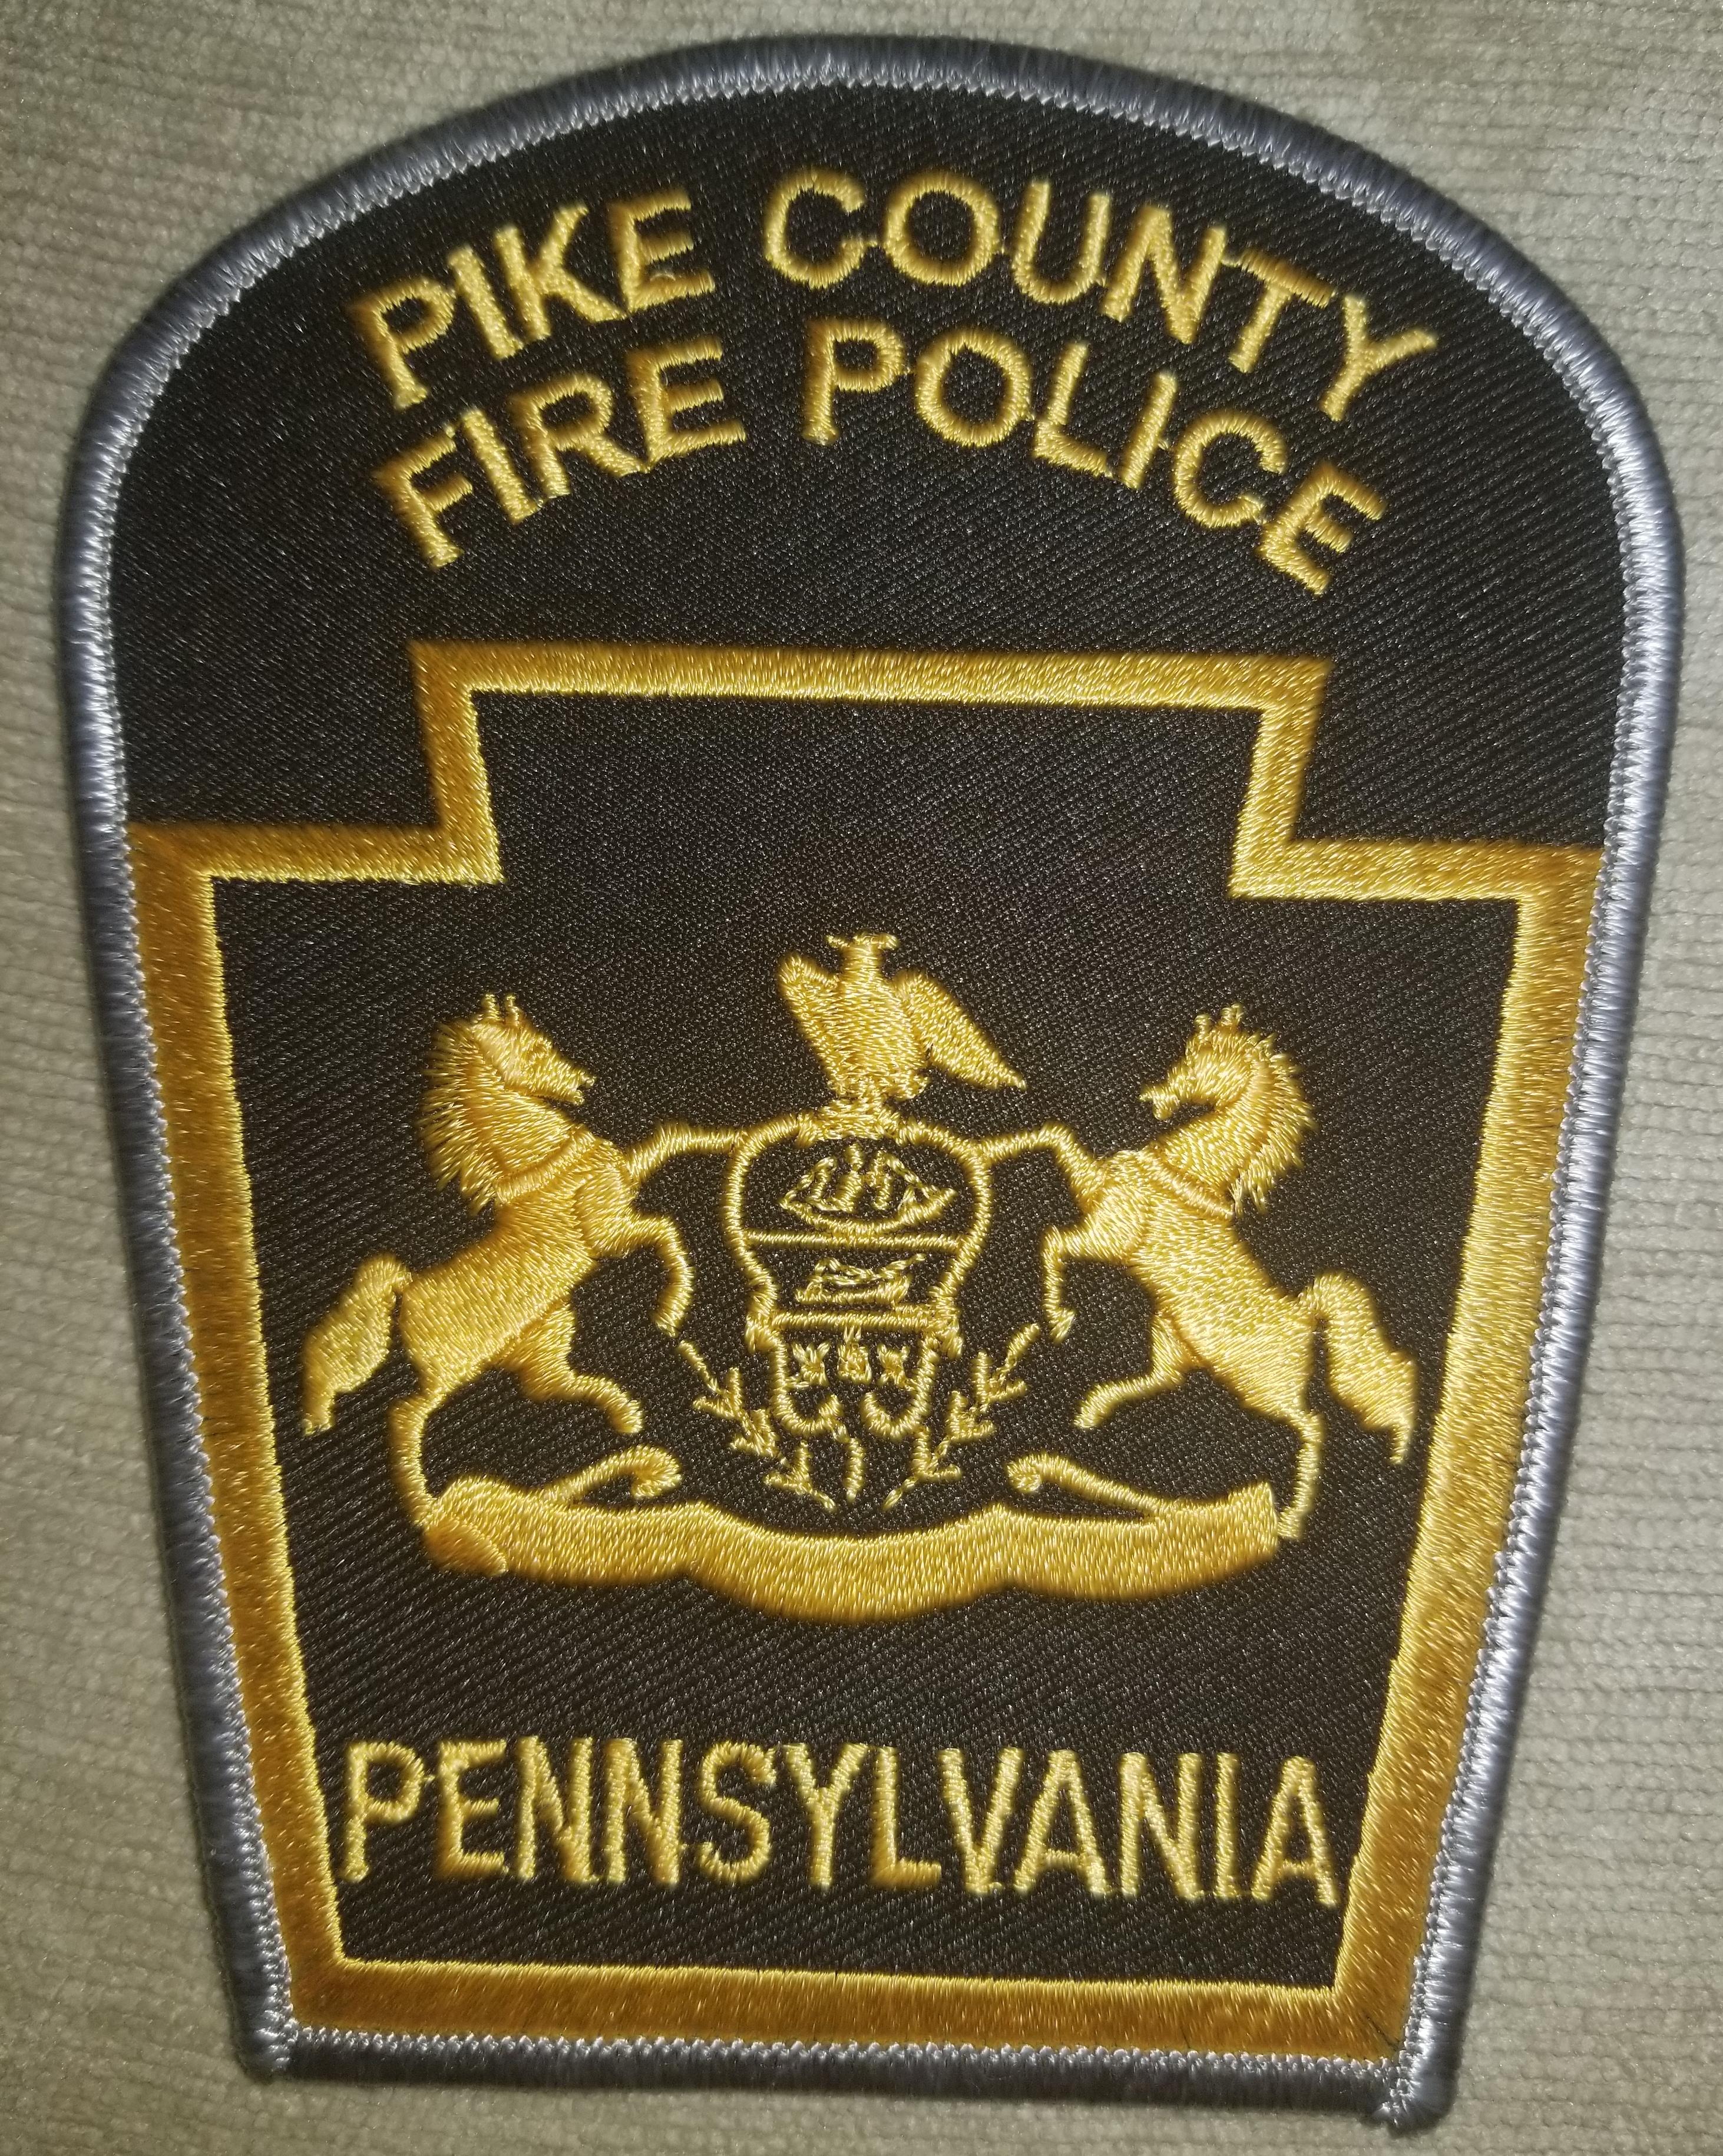 Pike County Fire Police PA